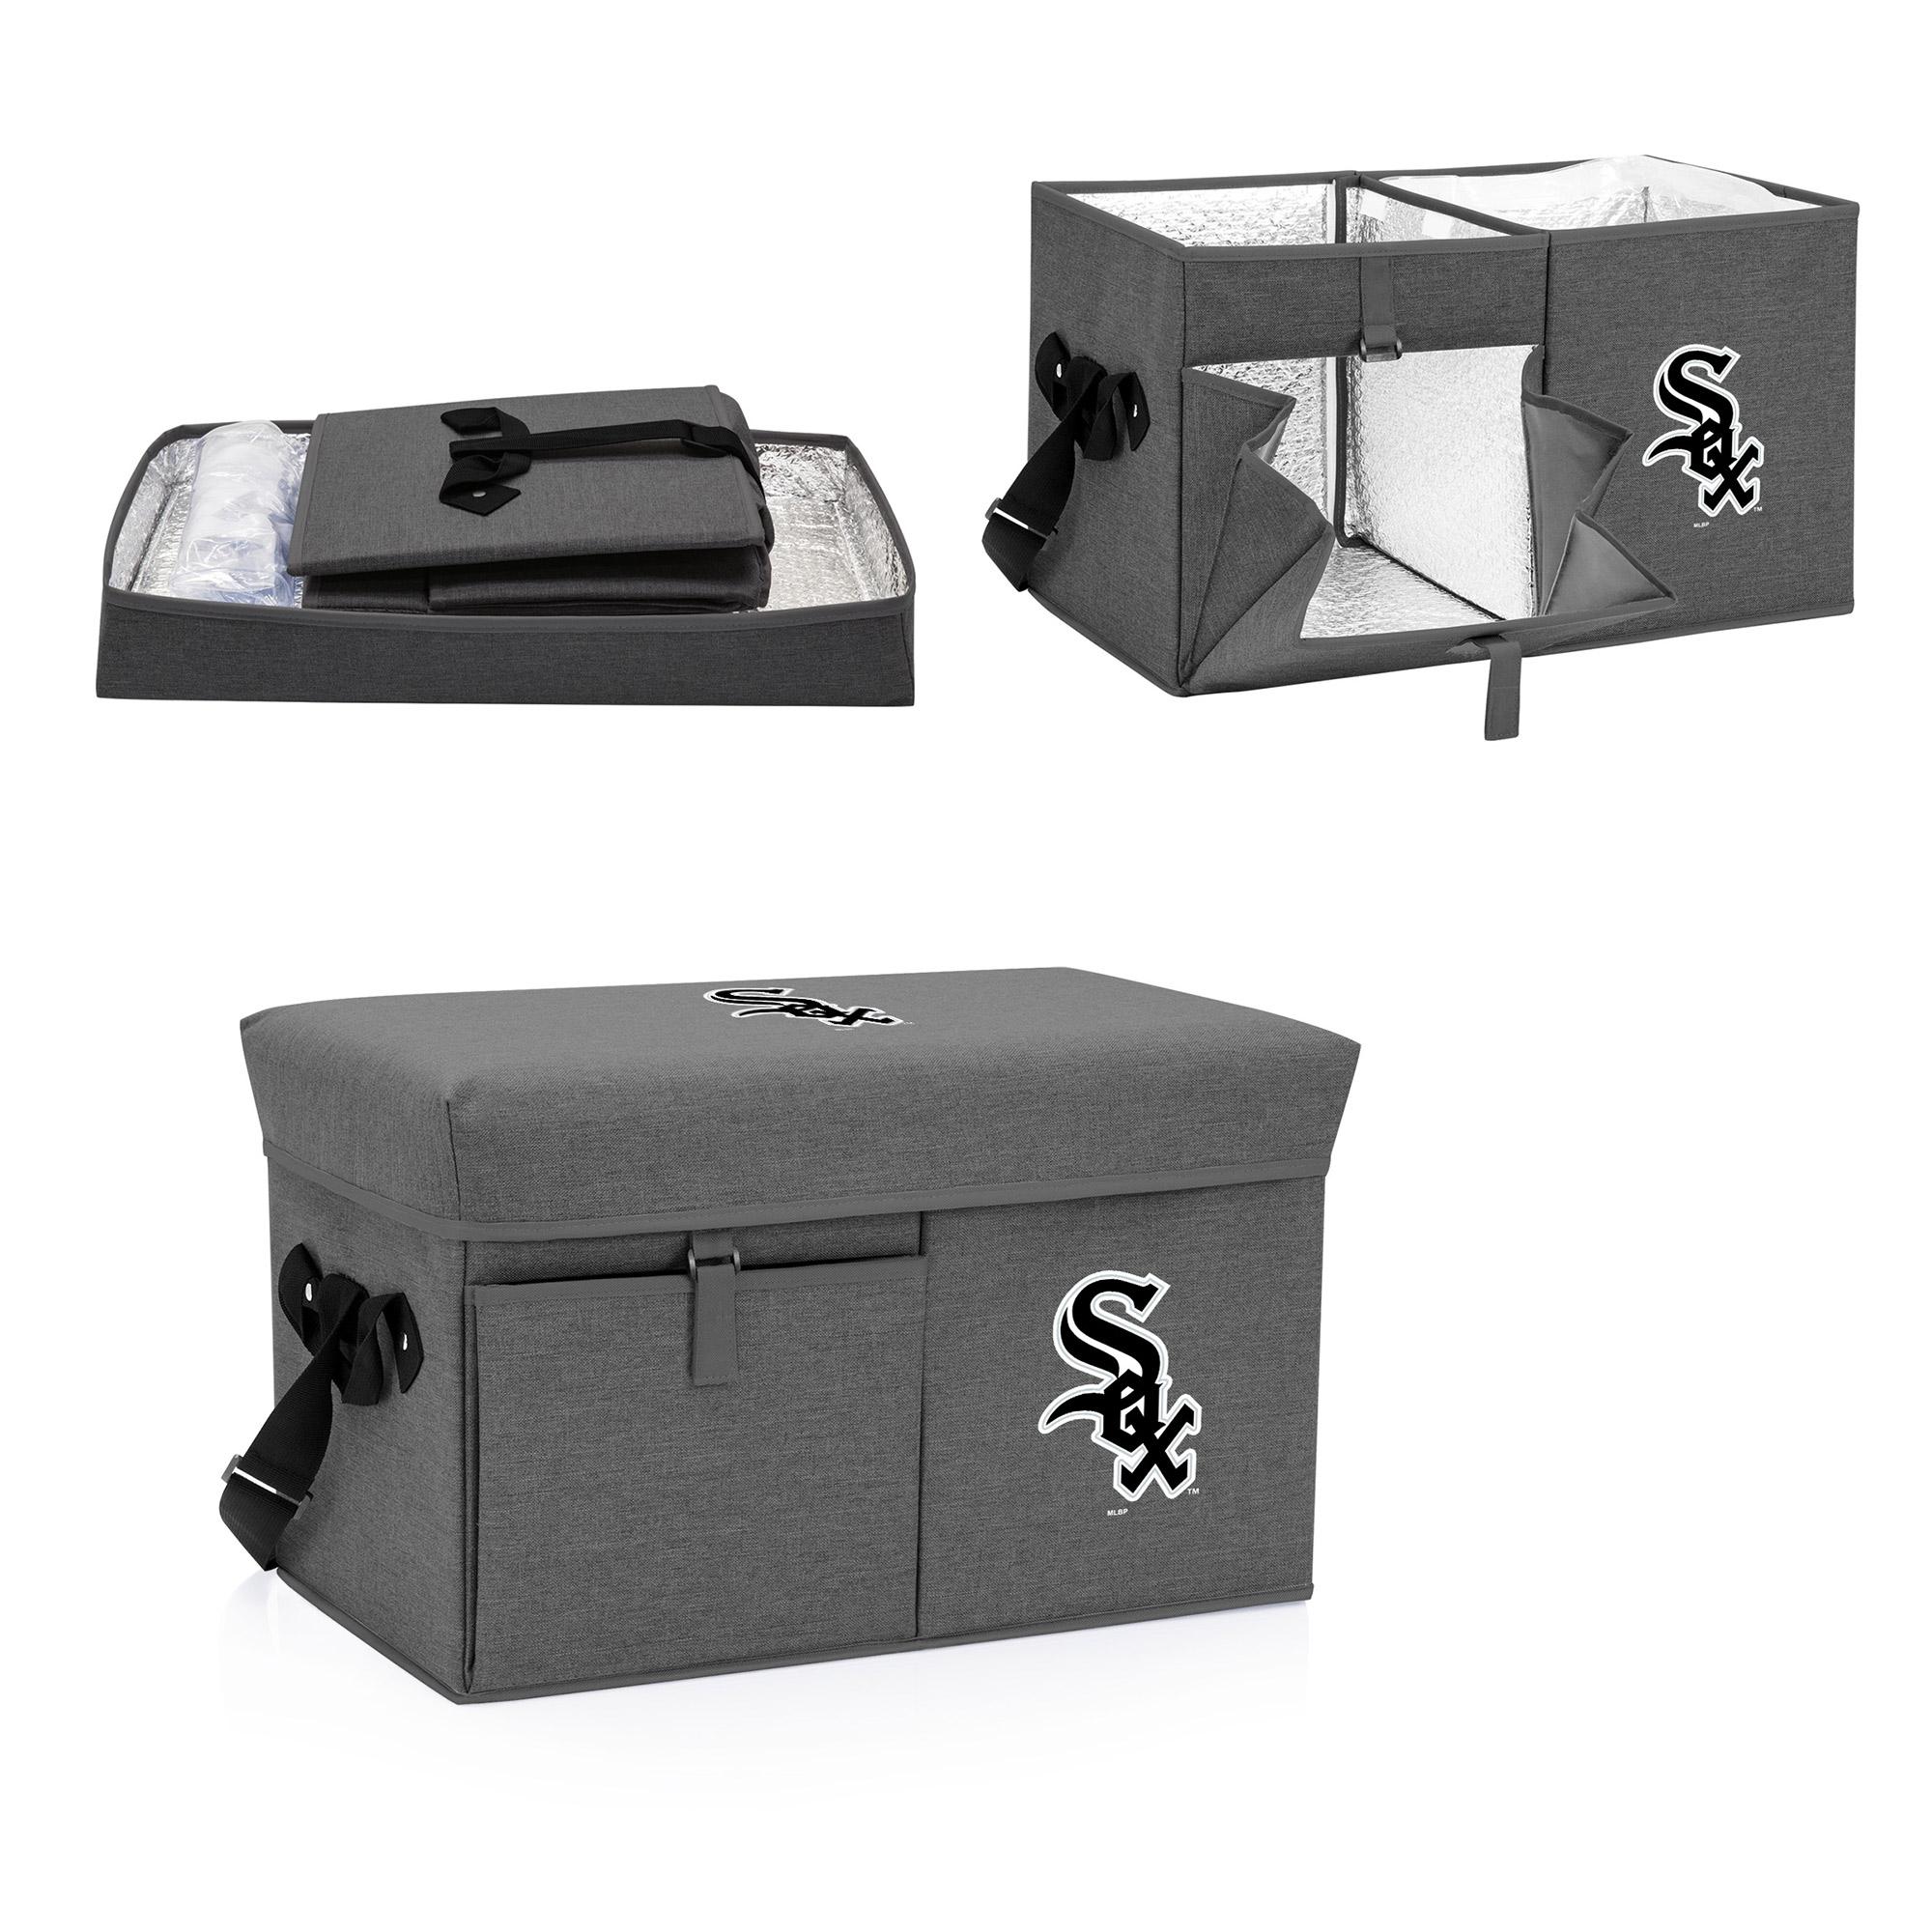 Chicago White Sox Ottoman Cooler & Seat - Gray - No Size